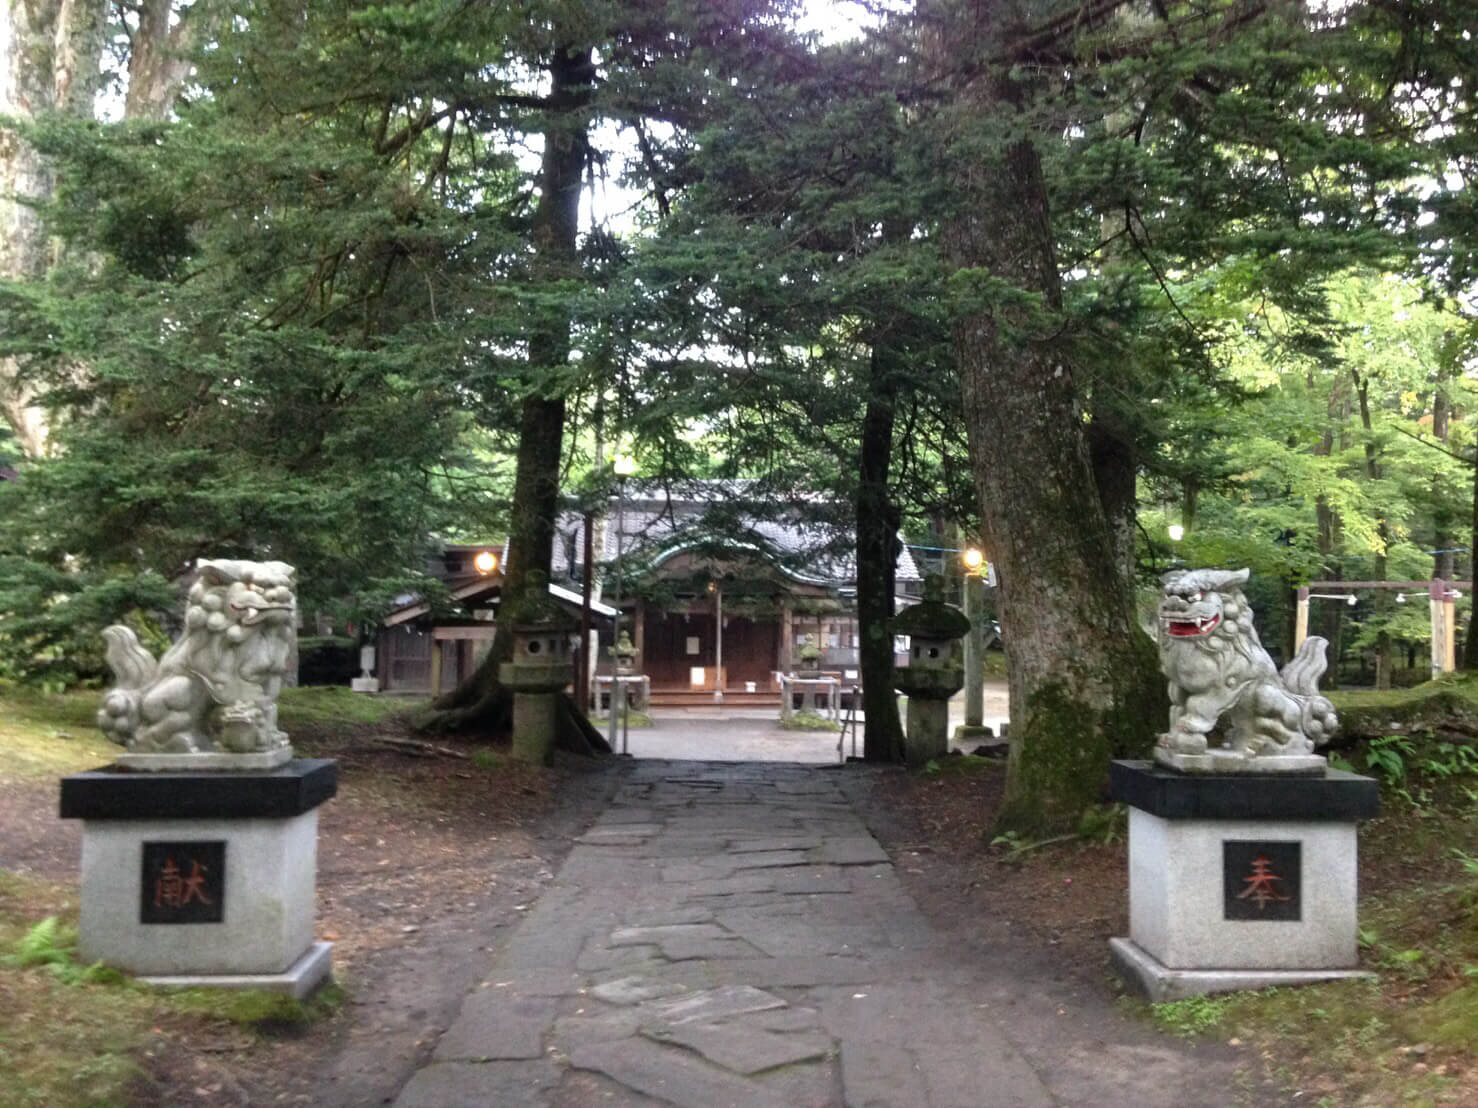 軽井沢 karuizawa 諏訪神社 suwa shrine